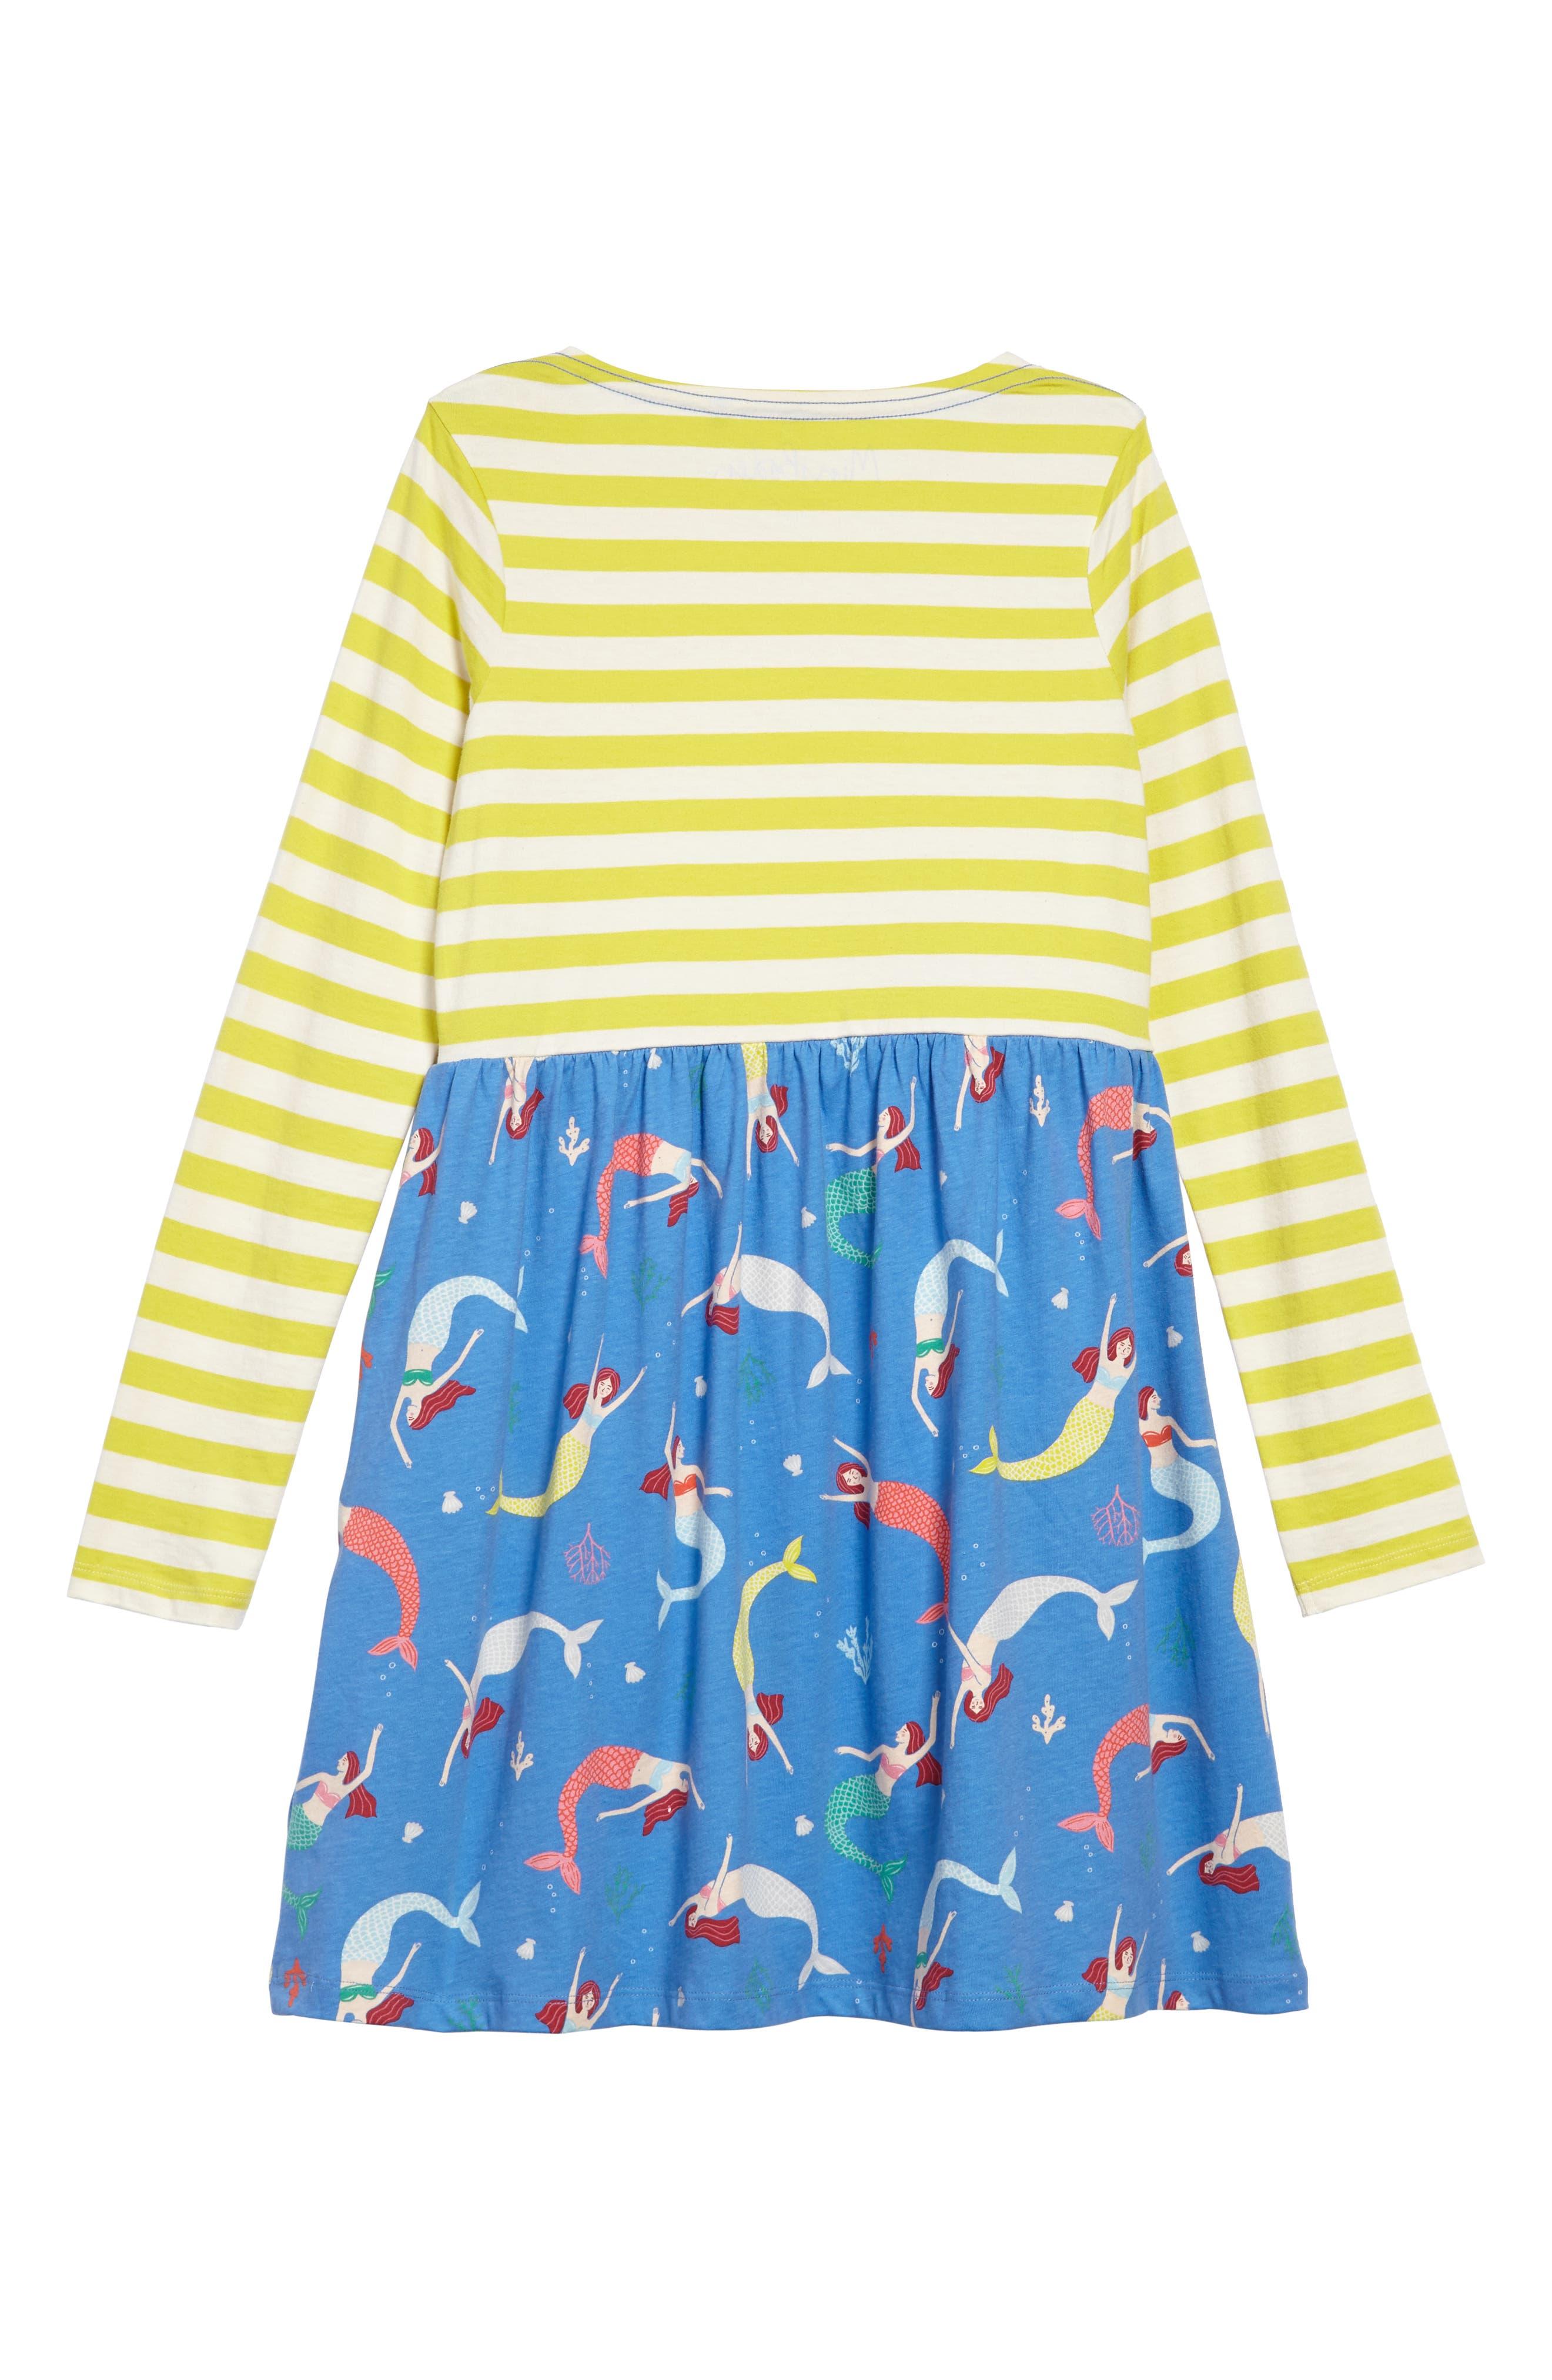 Hotchpotch Jersey Dress,                             Alternate thumbnail 2, color,                             Penzance Blue Mermaid